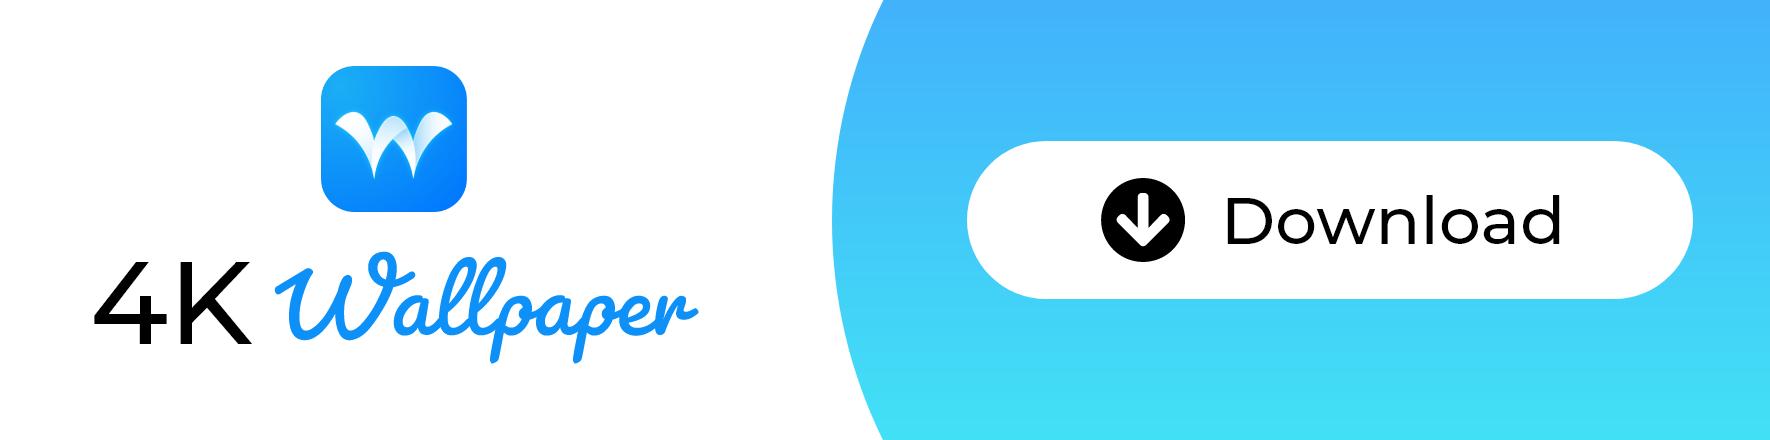 download 4k wallpaper app